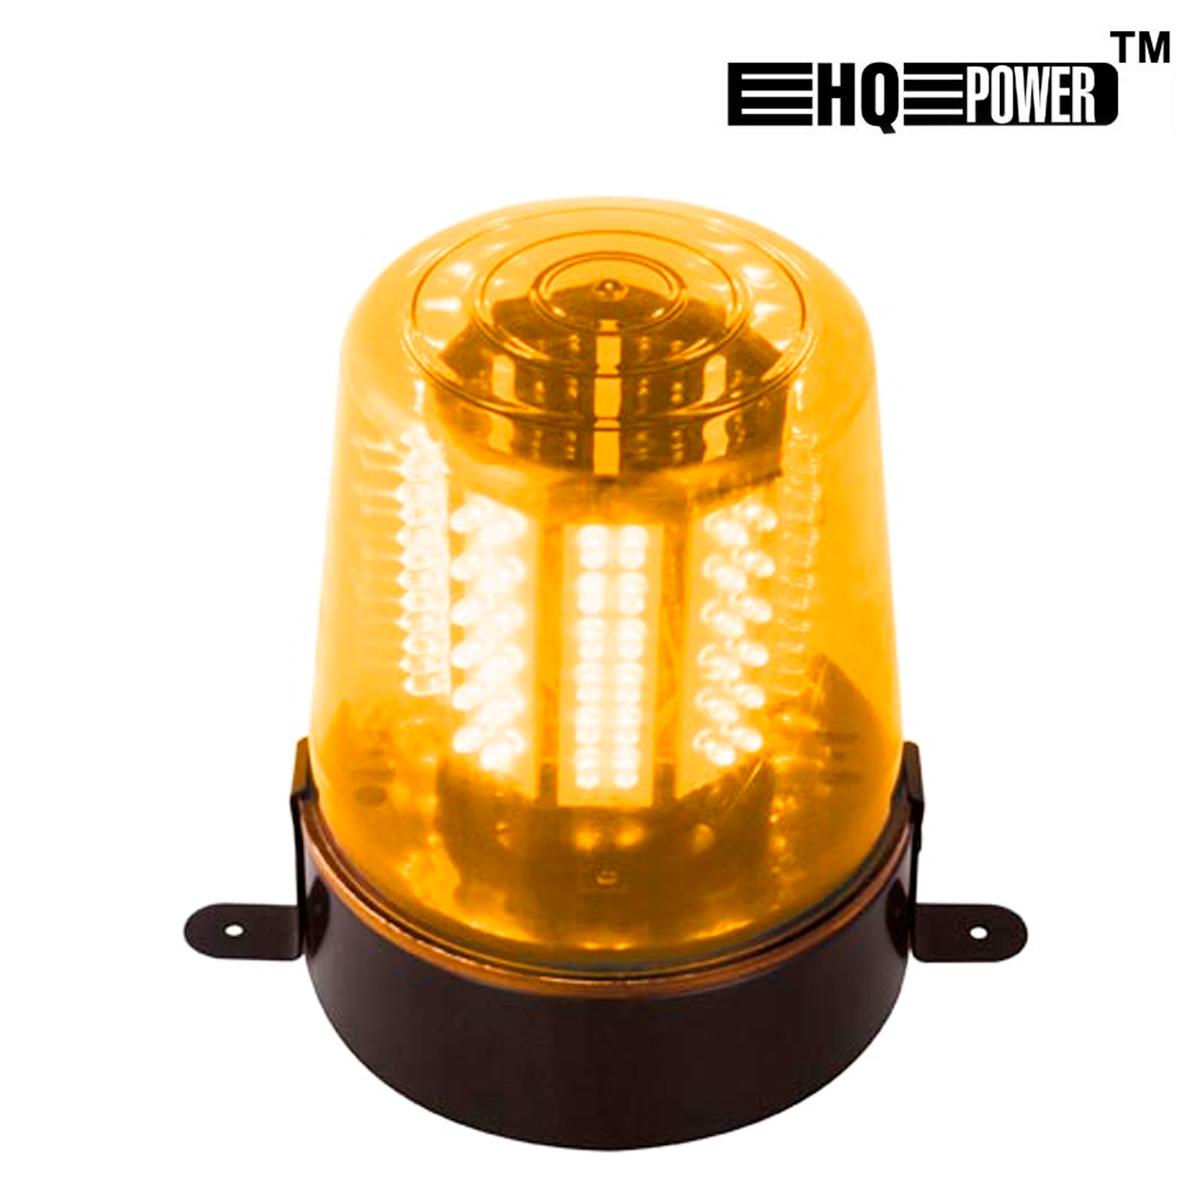 Luz rotativa leds 12v color naranja - Focos led con luces de colores ...